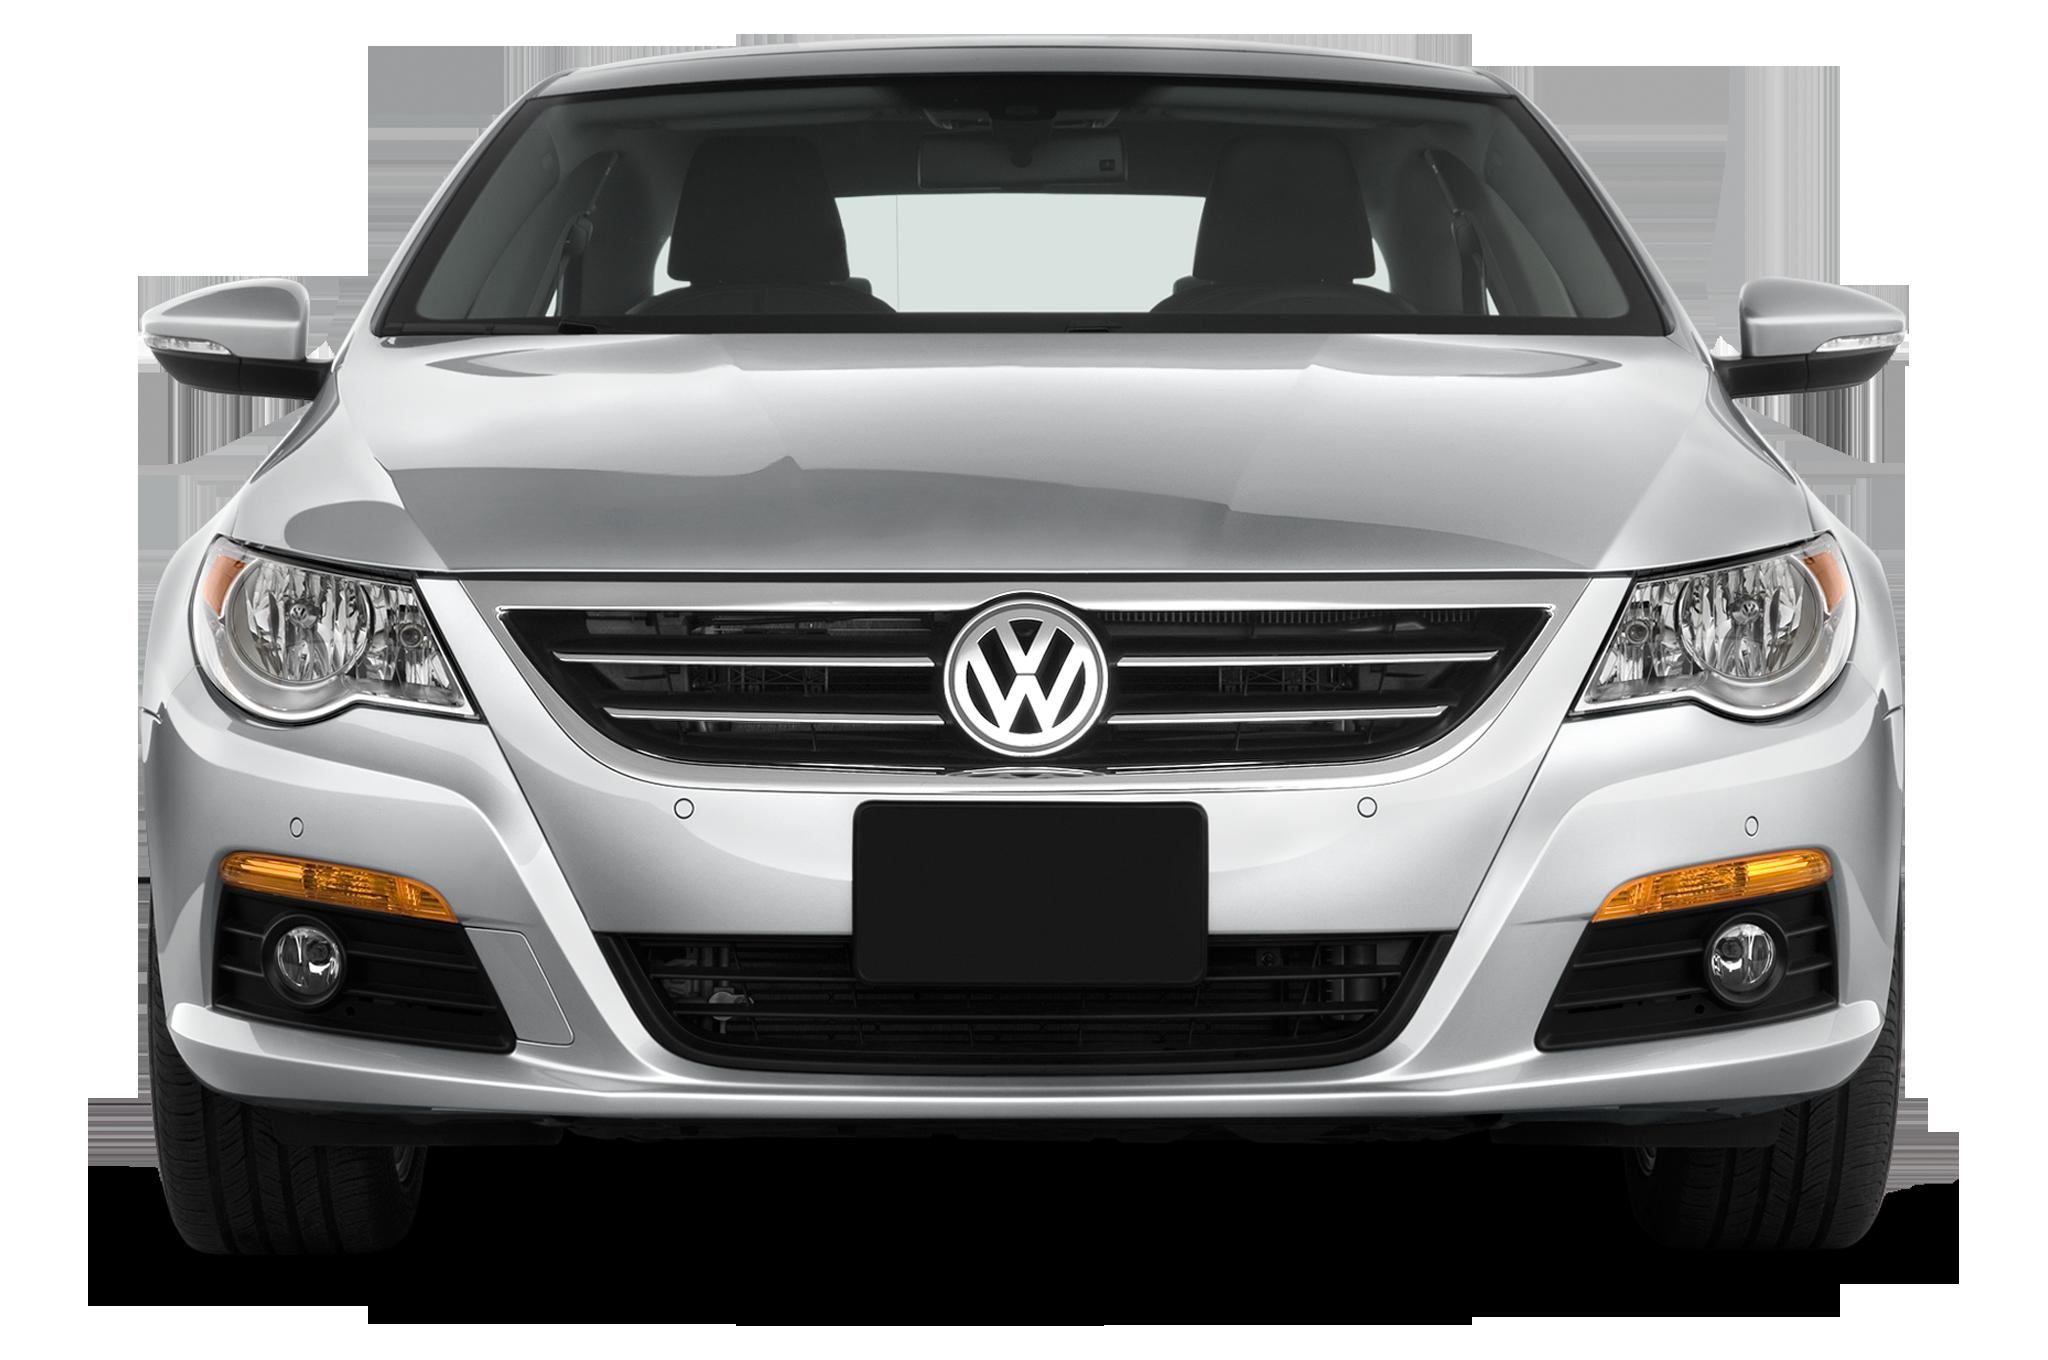 2012 Volkswagen CC LUX Limited - Editors' Notebook - Automobile Magazine